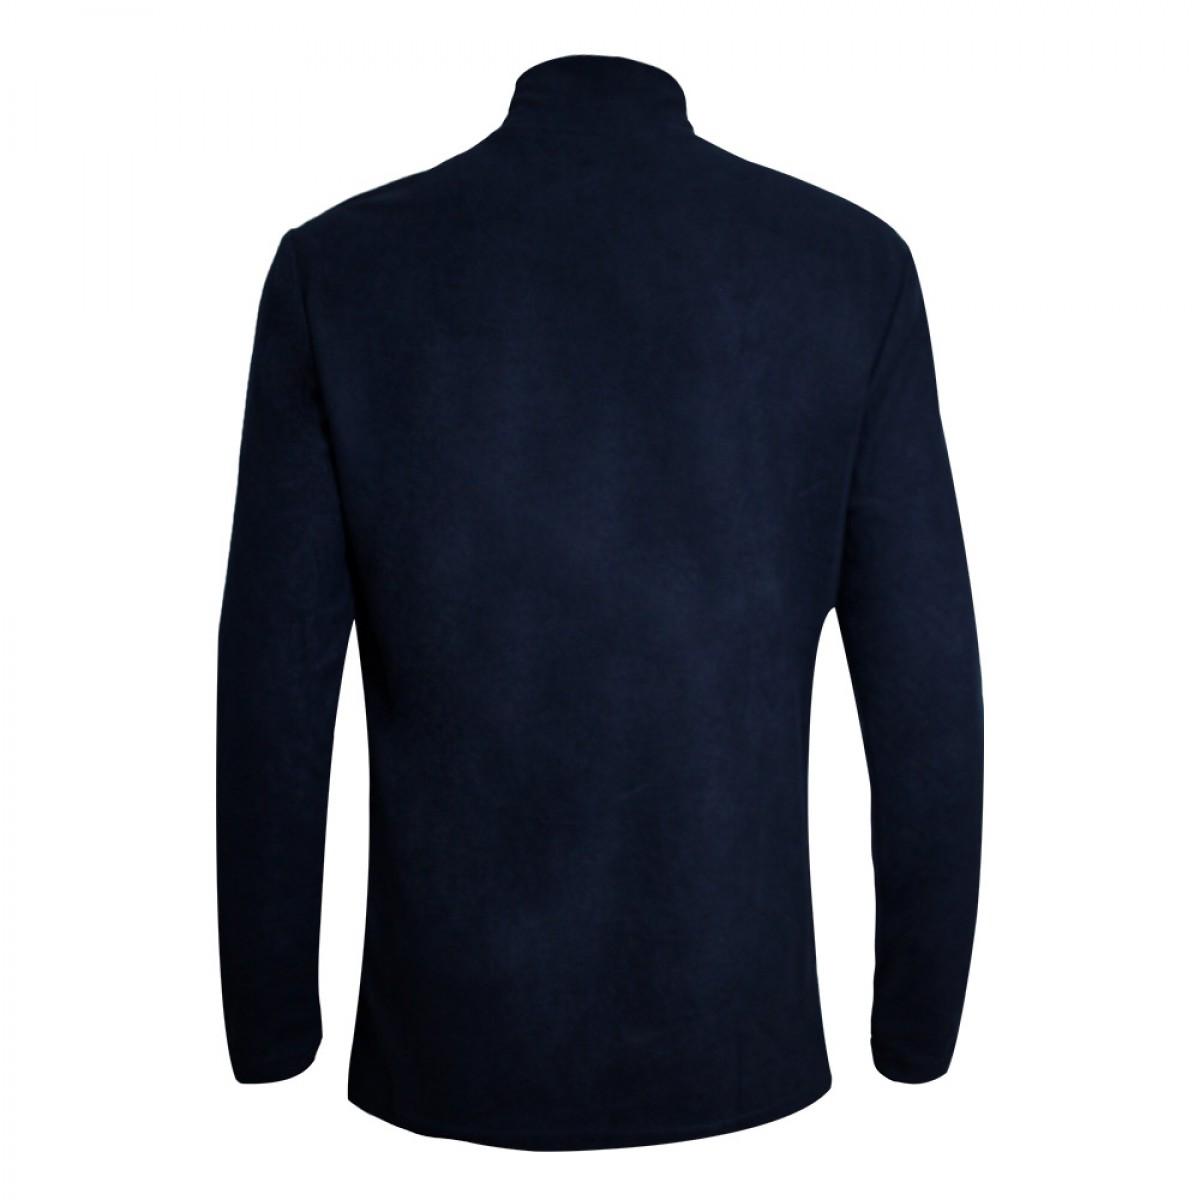 women-high-neck-vest-khv96811-8a